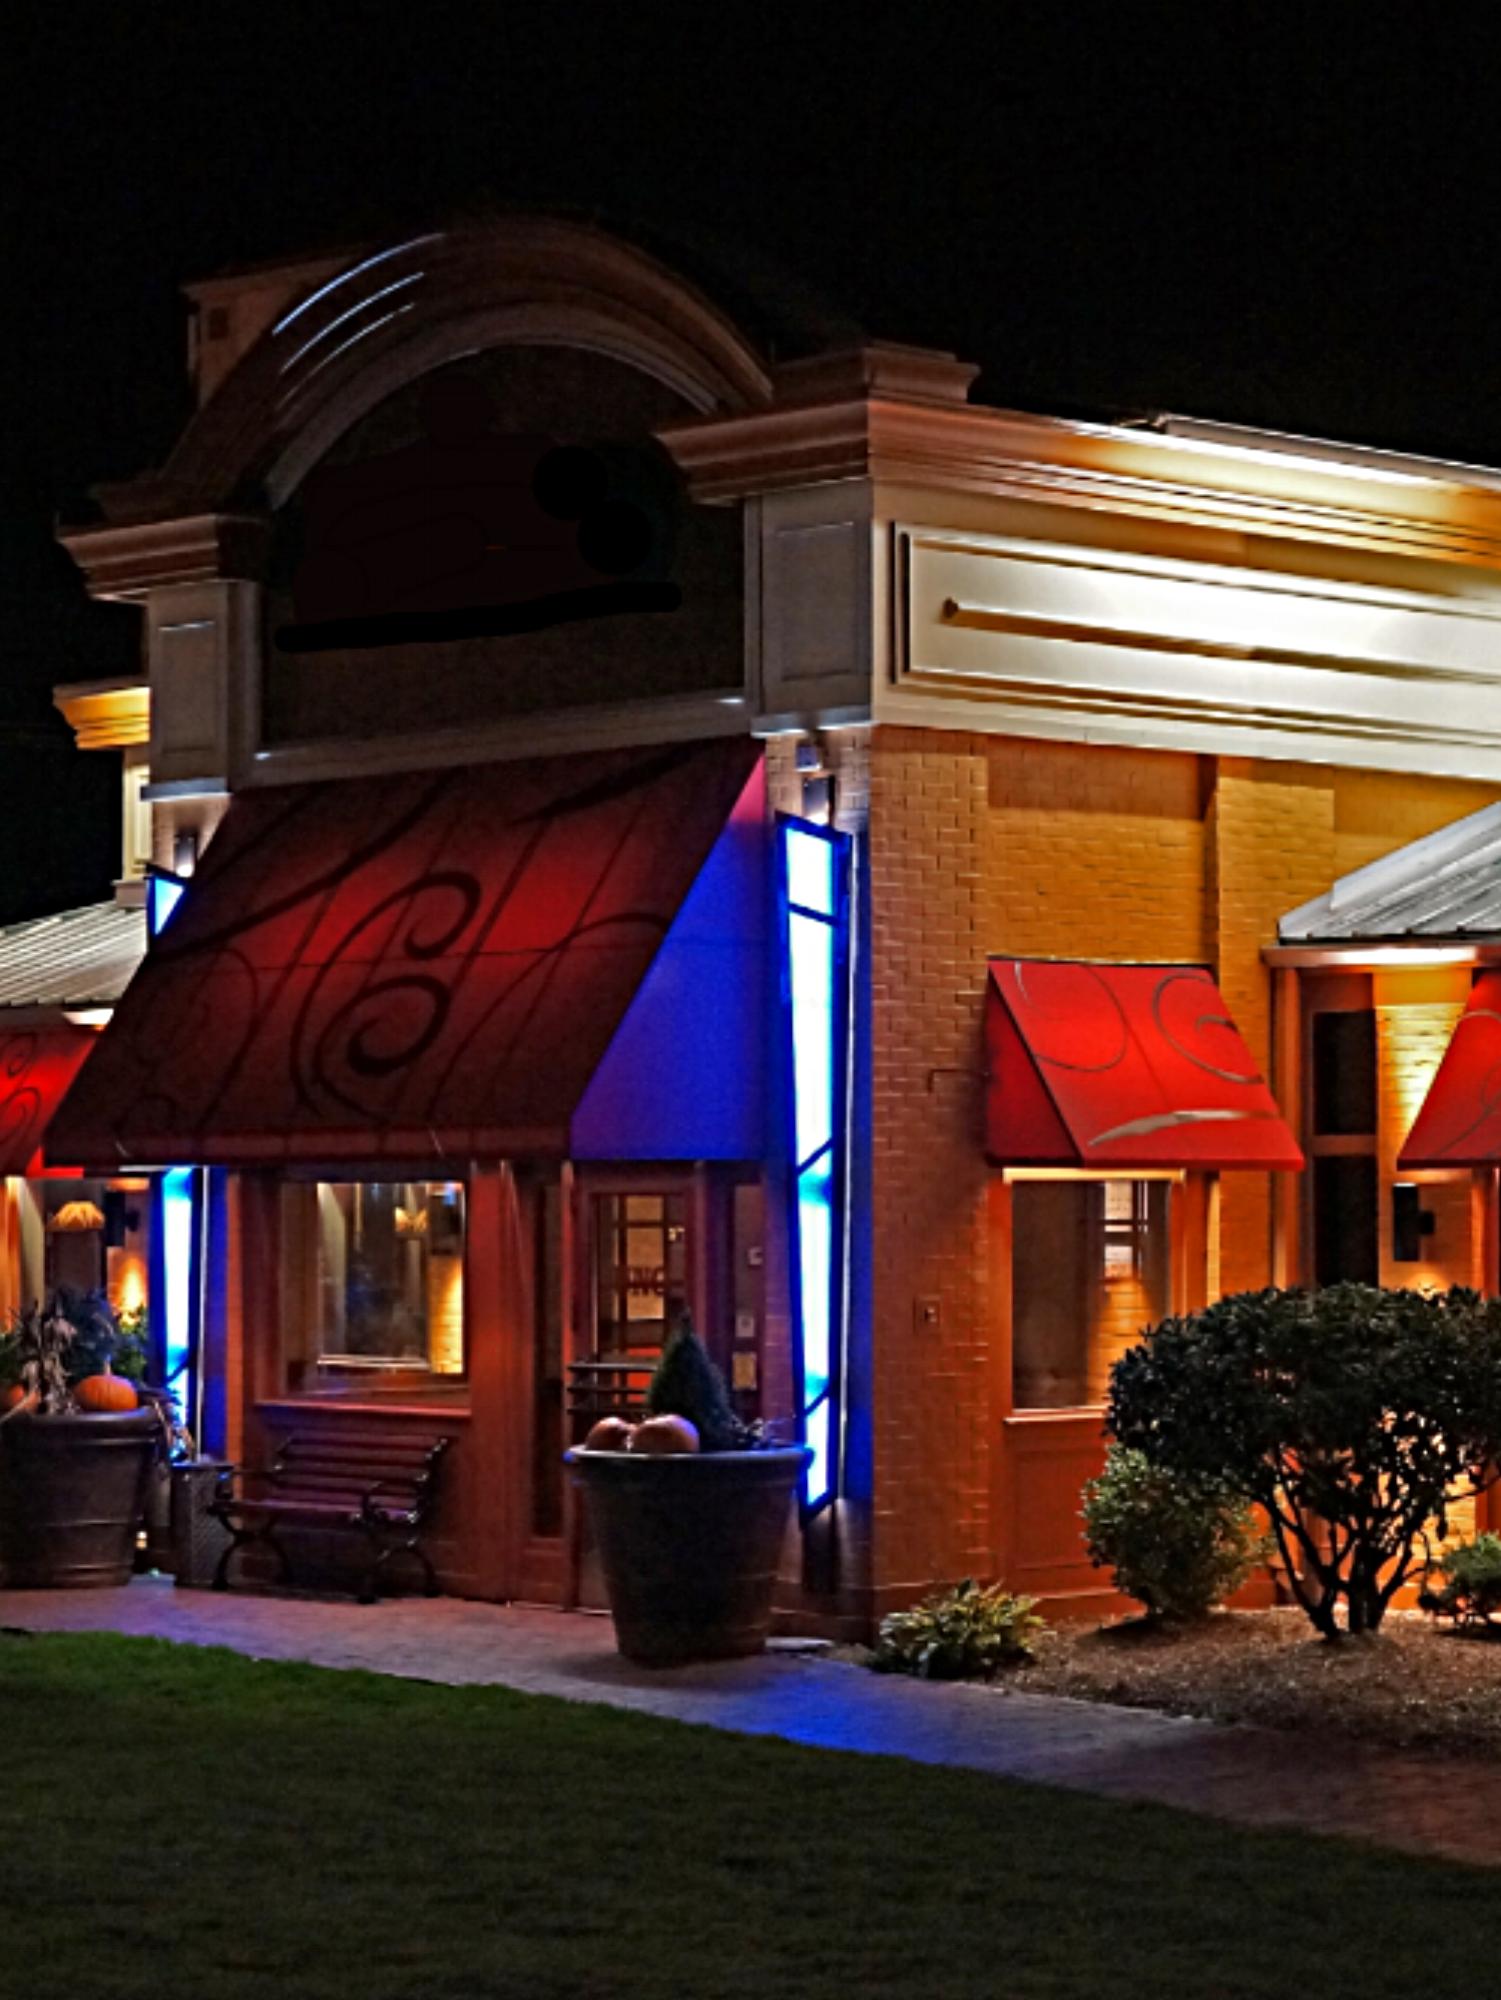 Exterior of Restaurant, Retail, Chesterfield Virginia